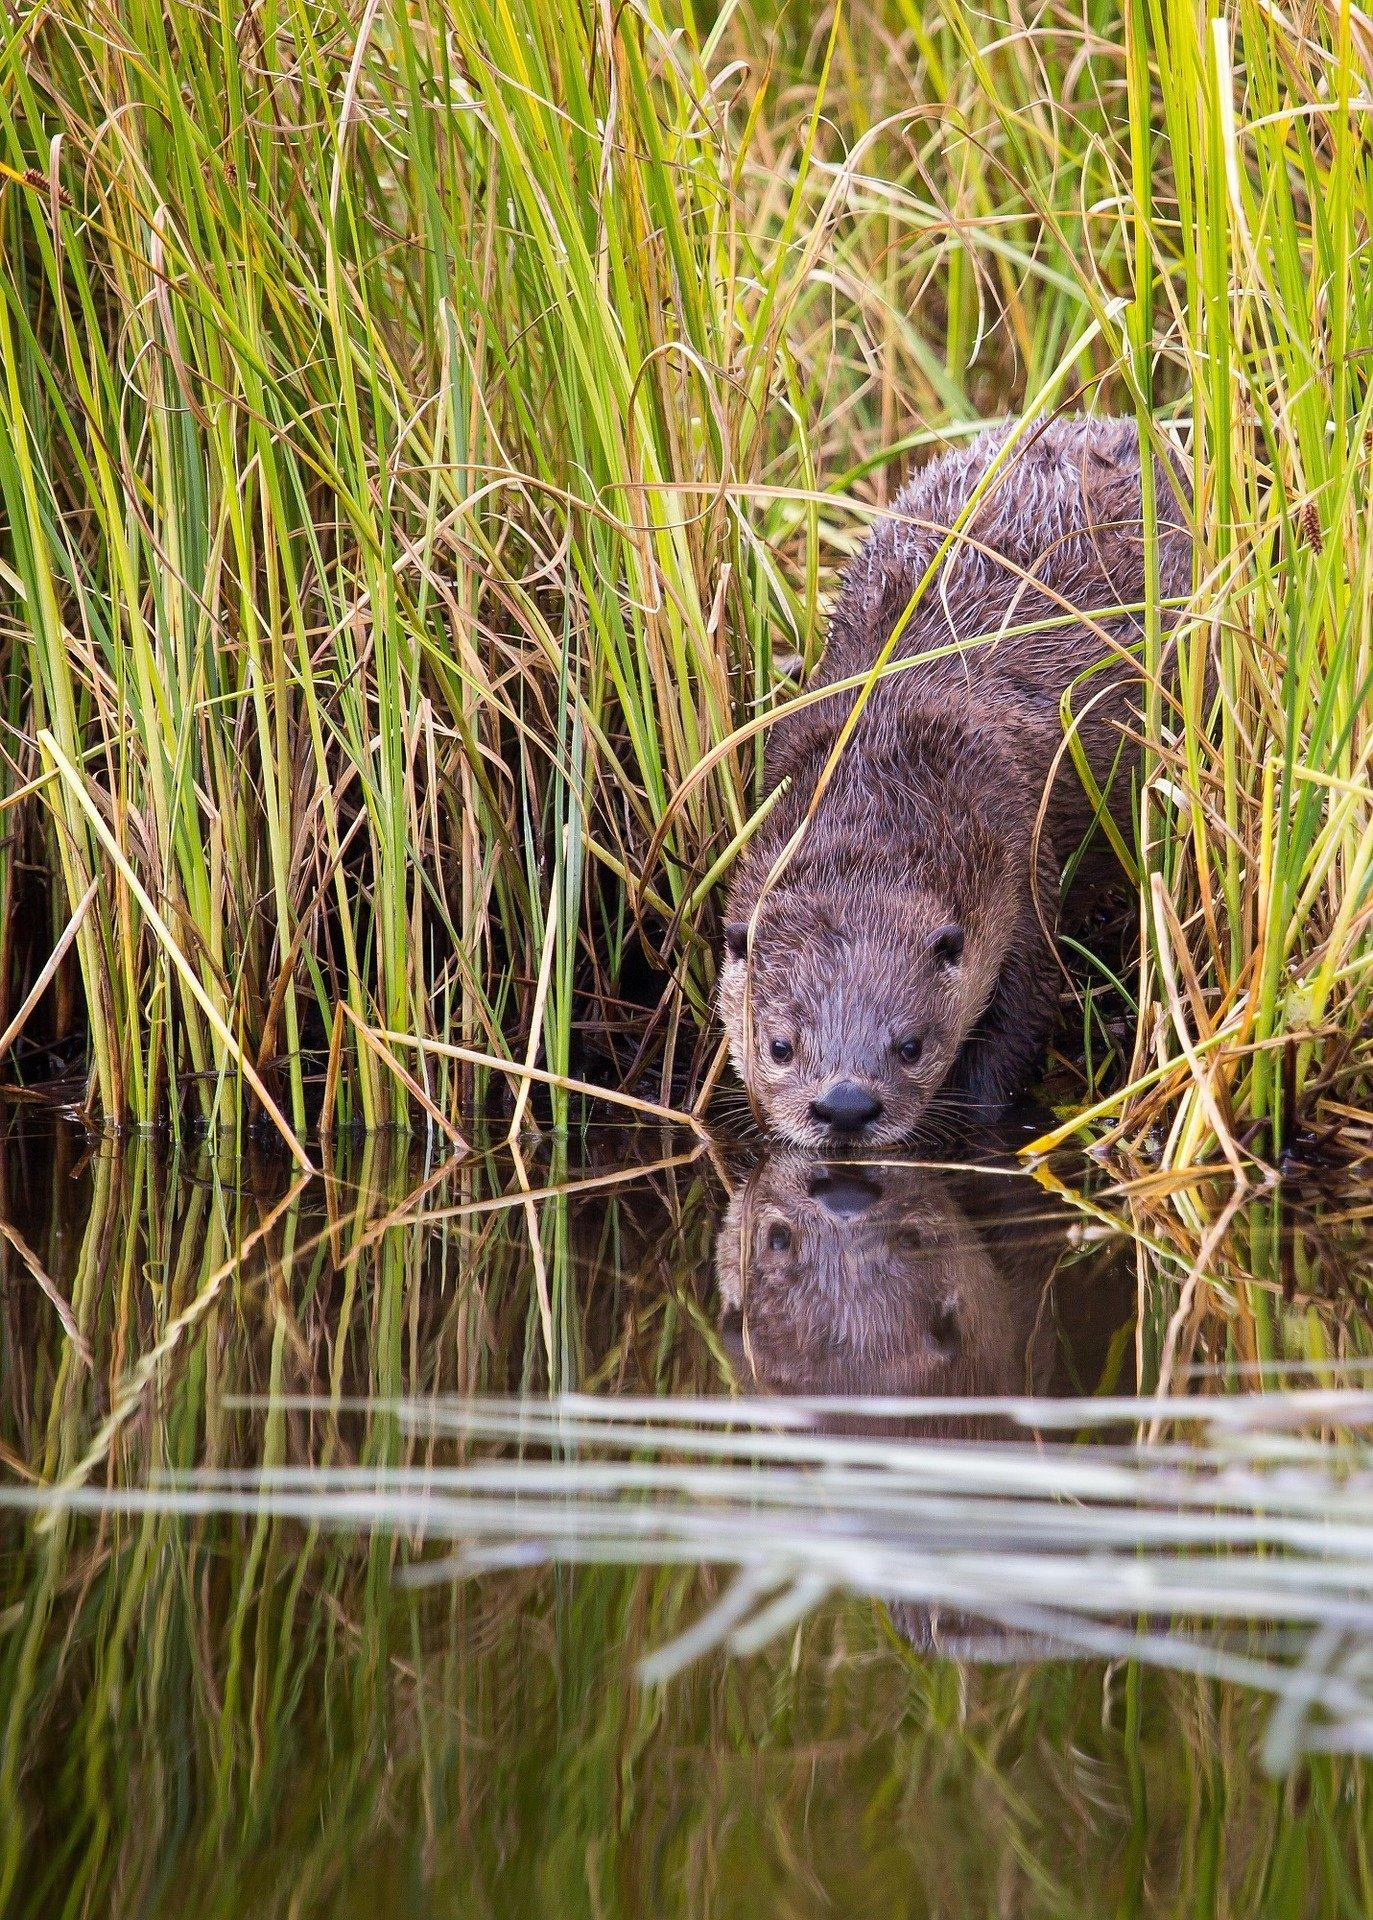 Sea animals - otters